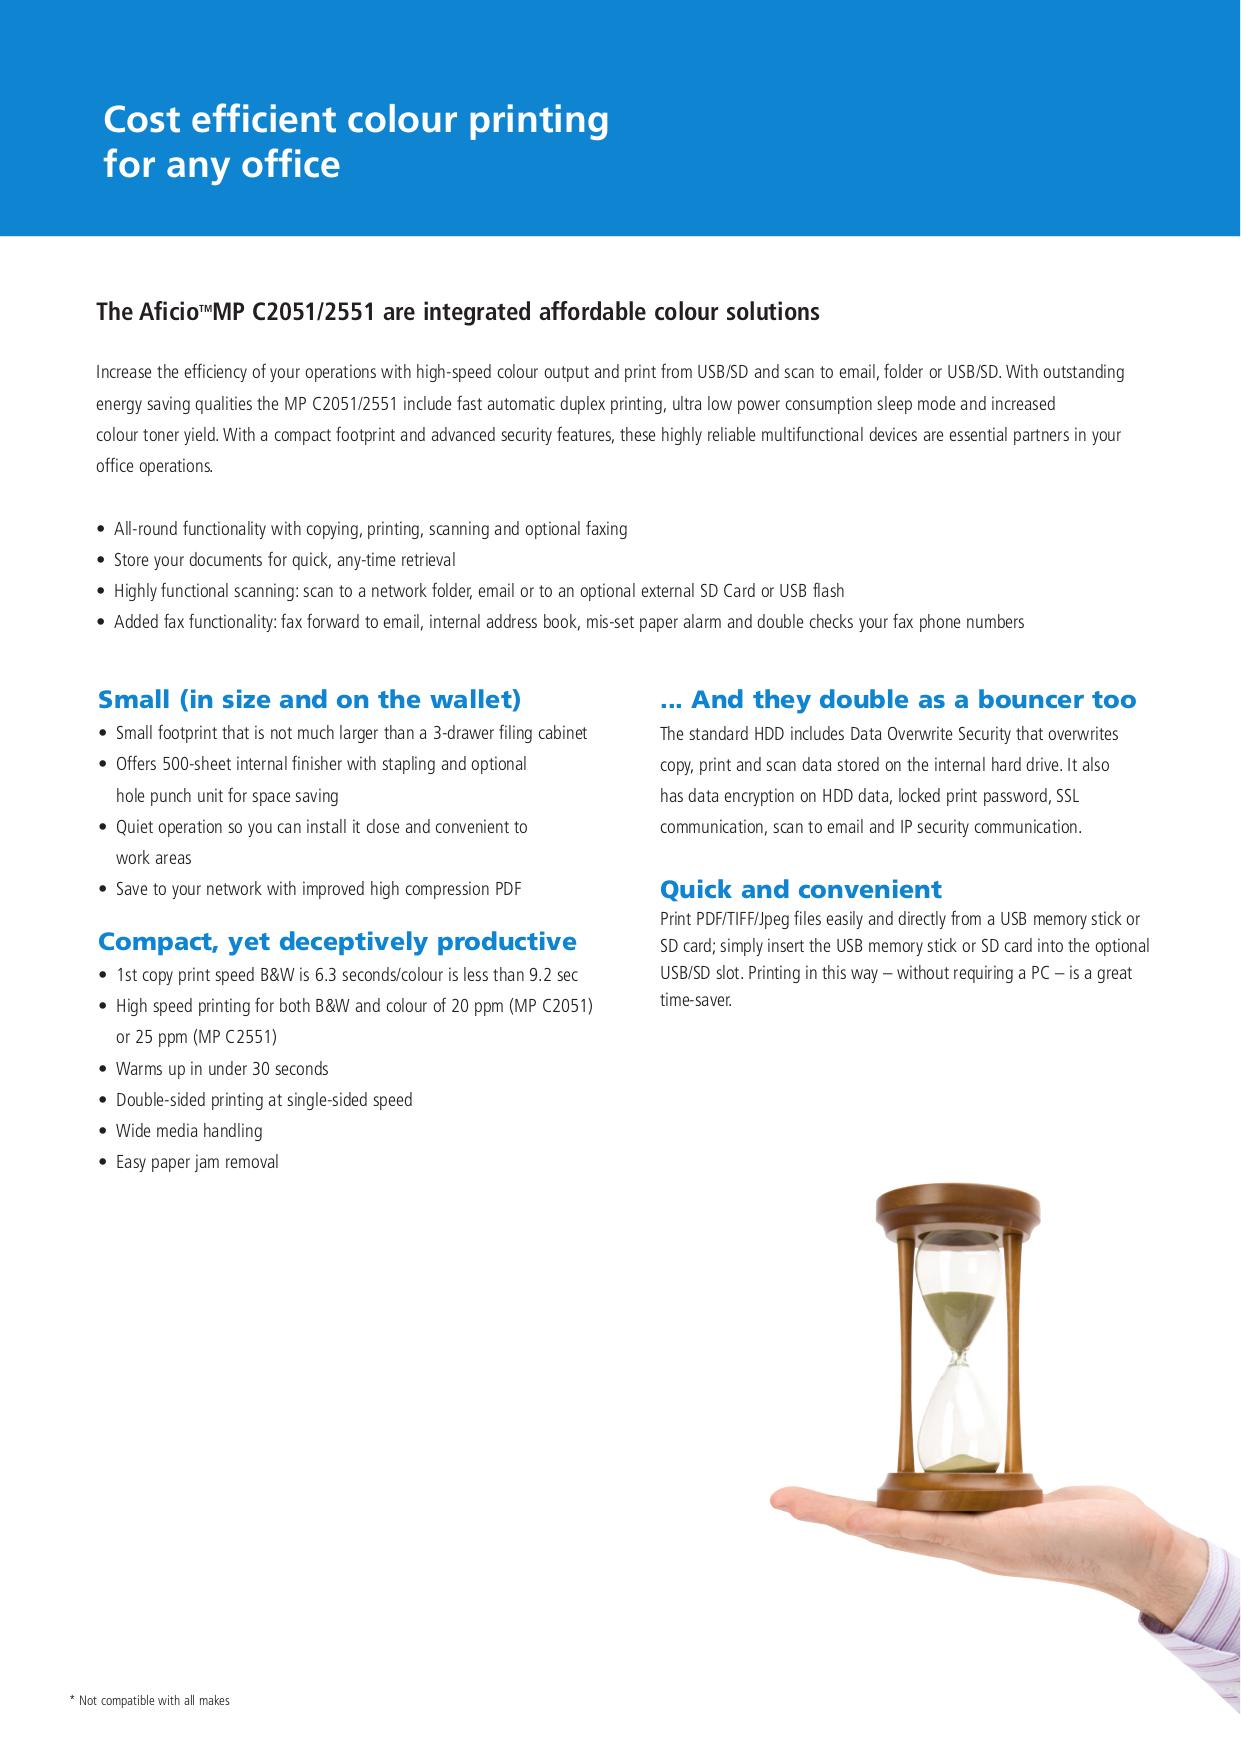 PDF manual for Ricoh Multifunction Printer Aficio 2051